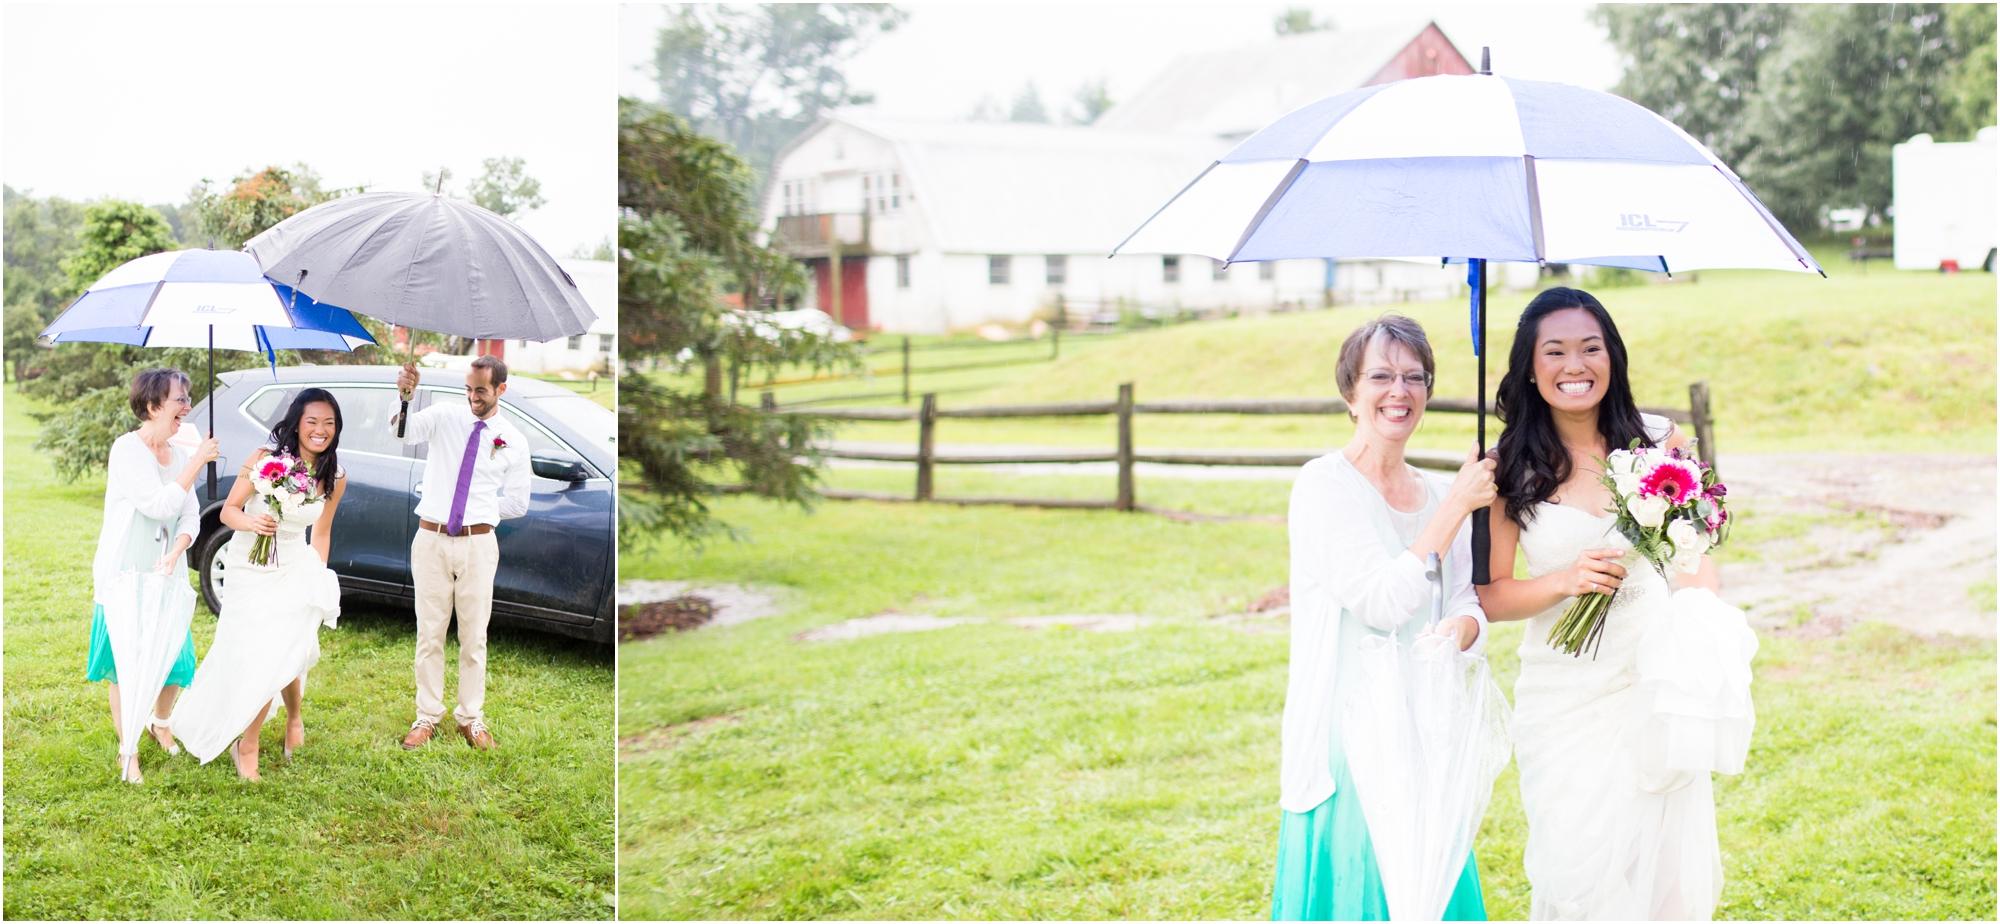 4-Hamby Wedding Ceremony-318_annagracephotography maryland wedding photographer genesee valley.jpg